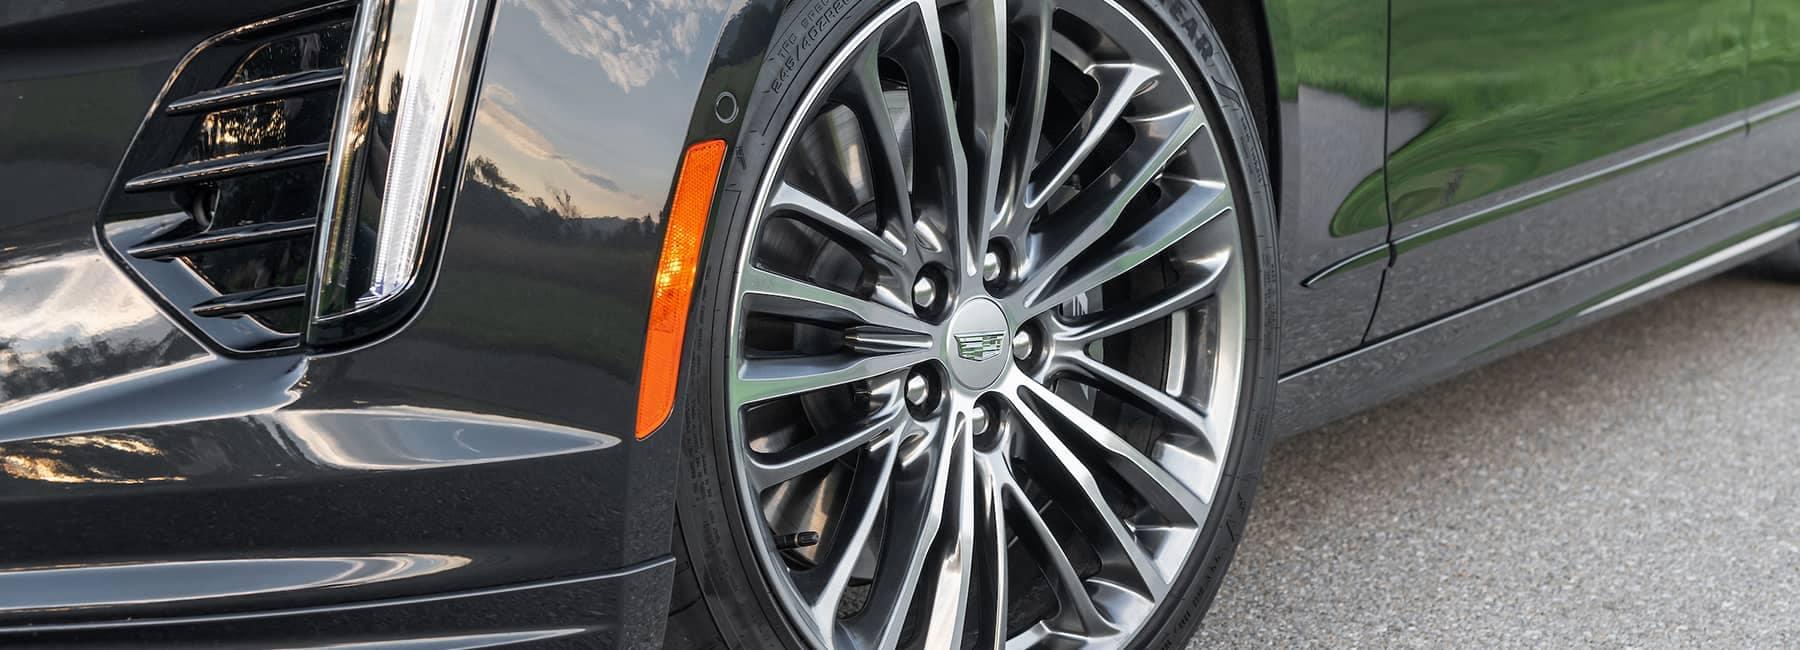 Cadillac tire